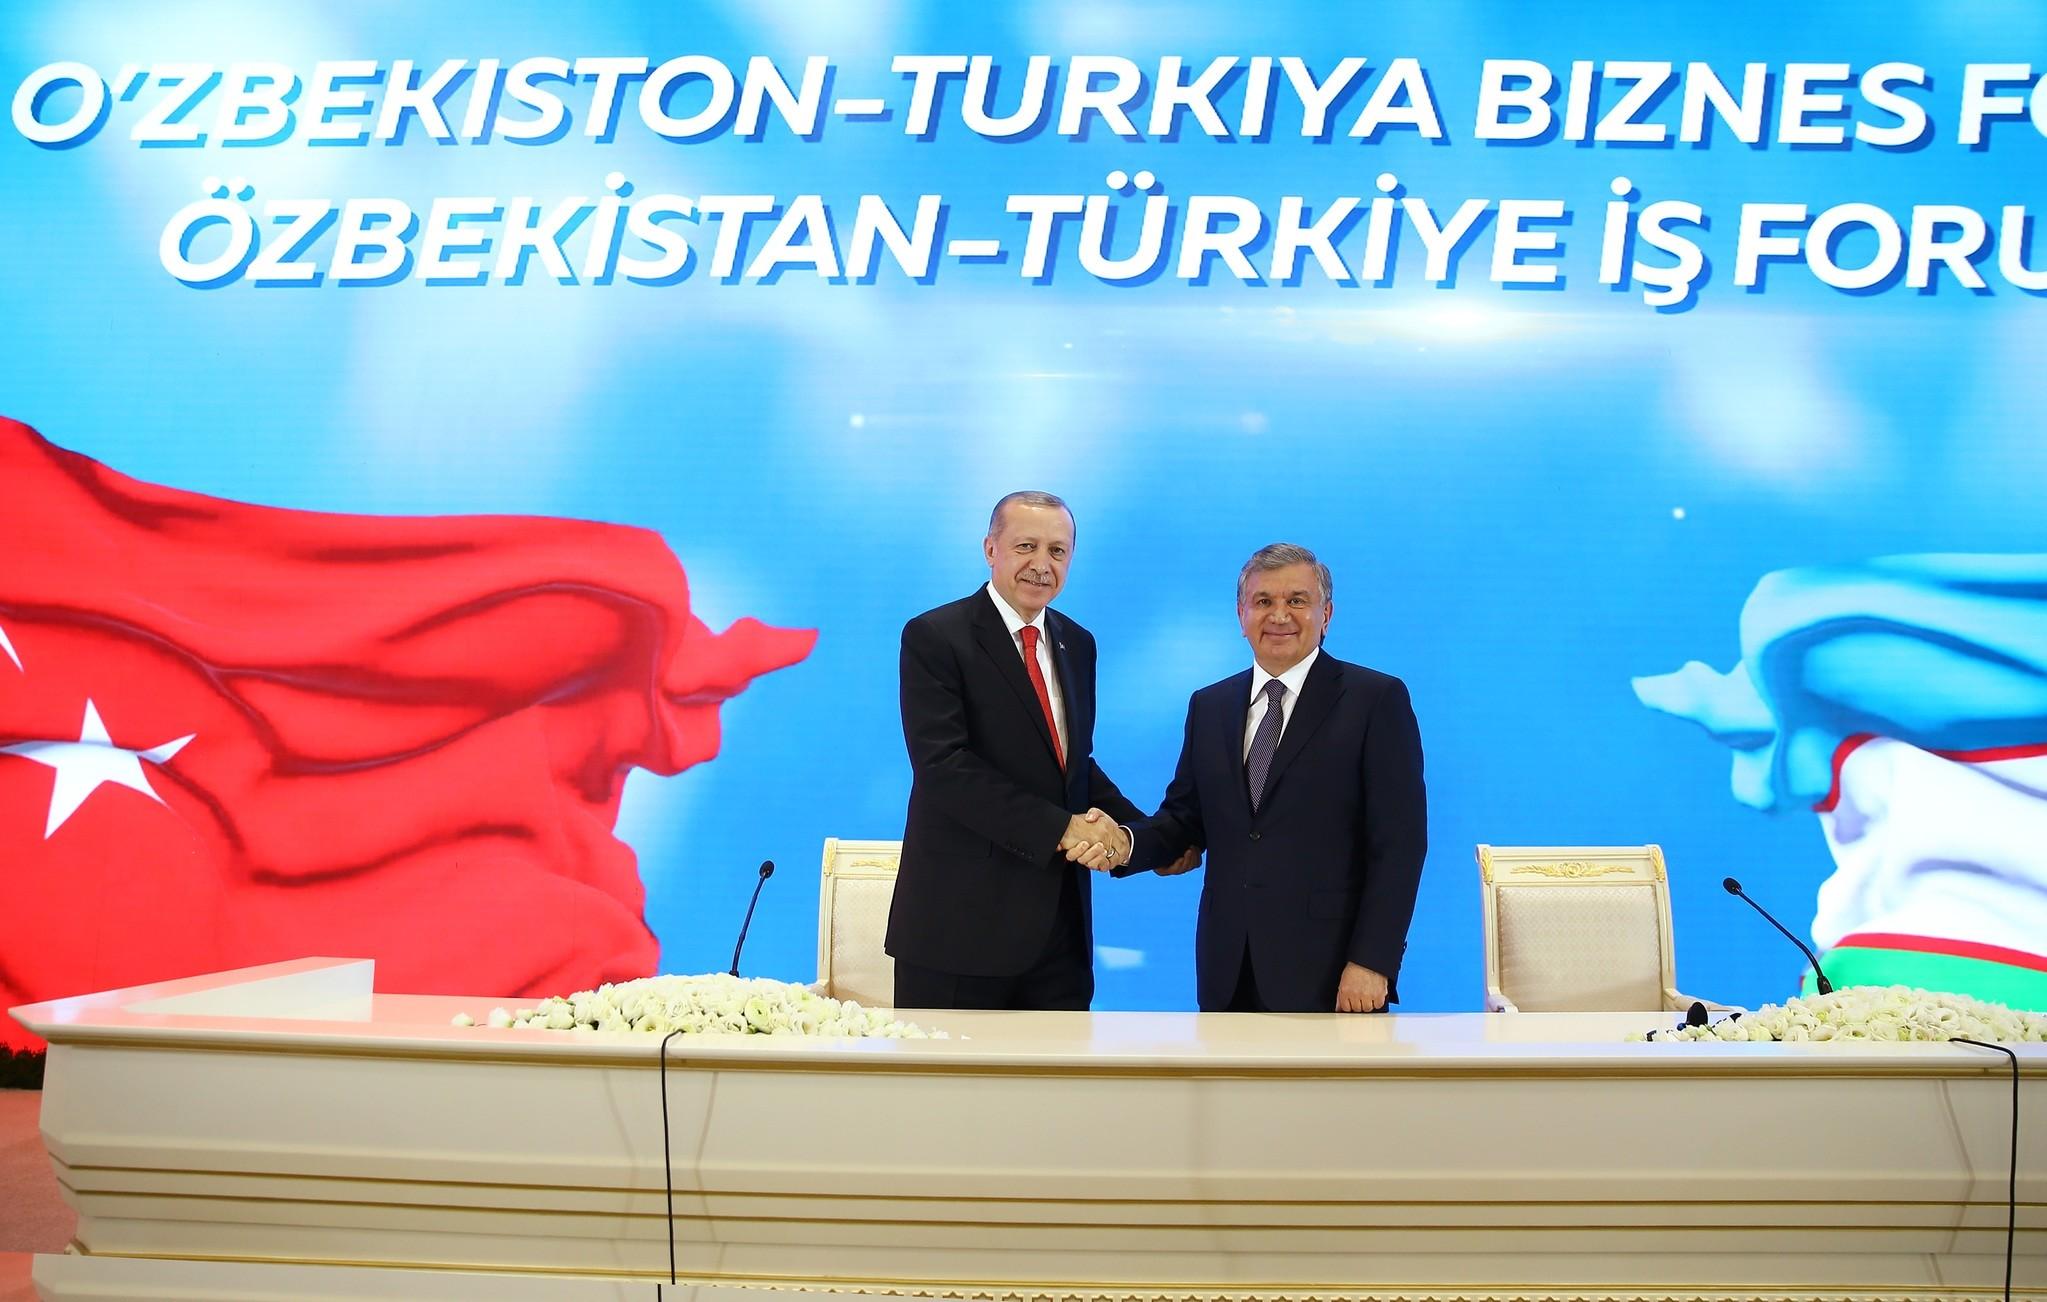 President Erdou011fan (L) and Uzbek President Mirziyoyev (R) attended the Turkey-Uzbekistan Business Forum in the Uzbekistan capital Tashkent, April 30.